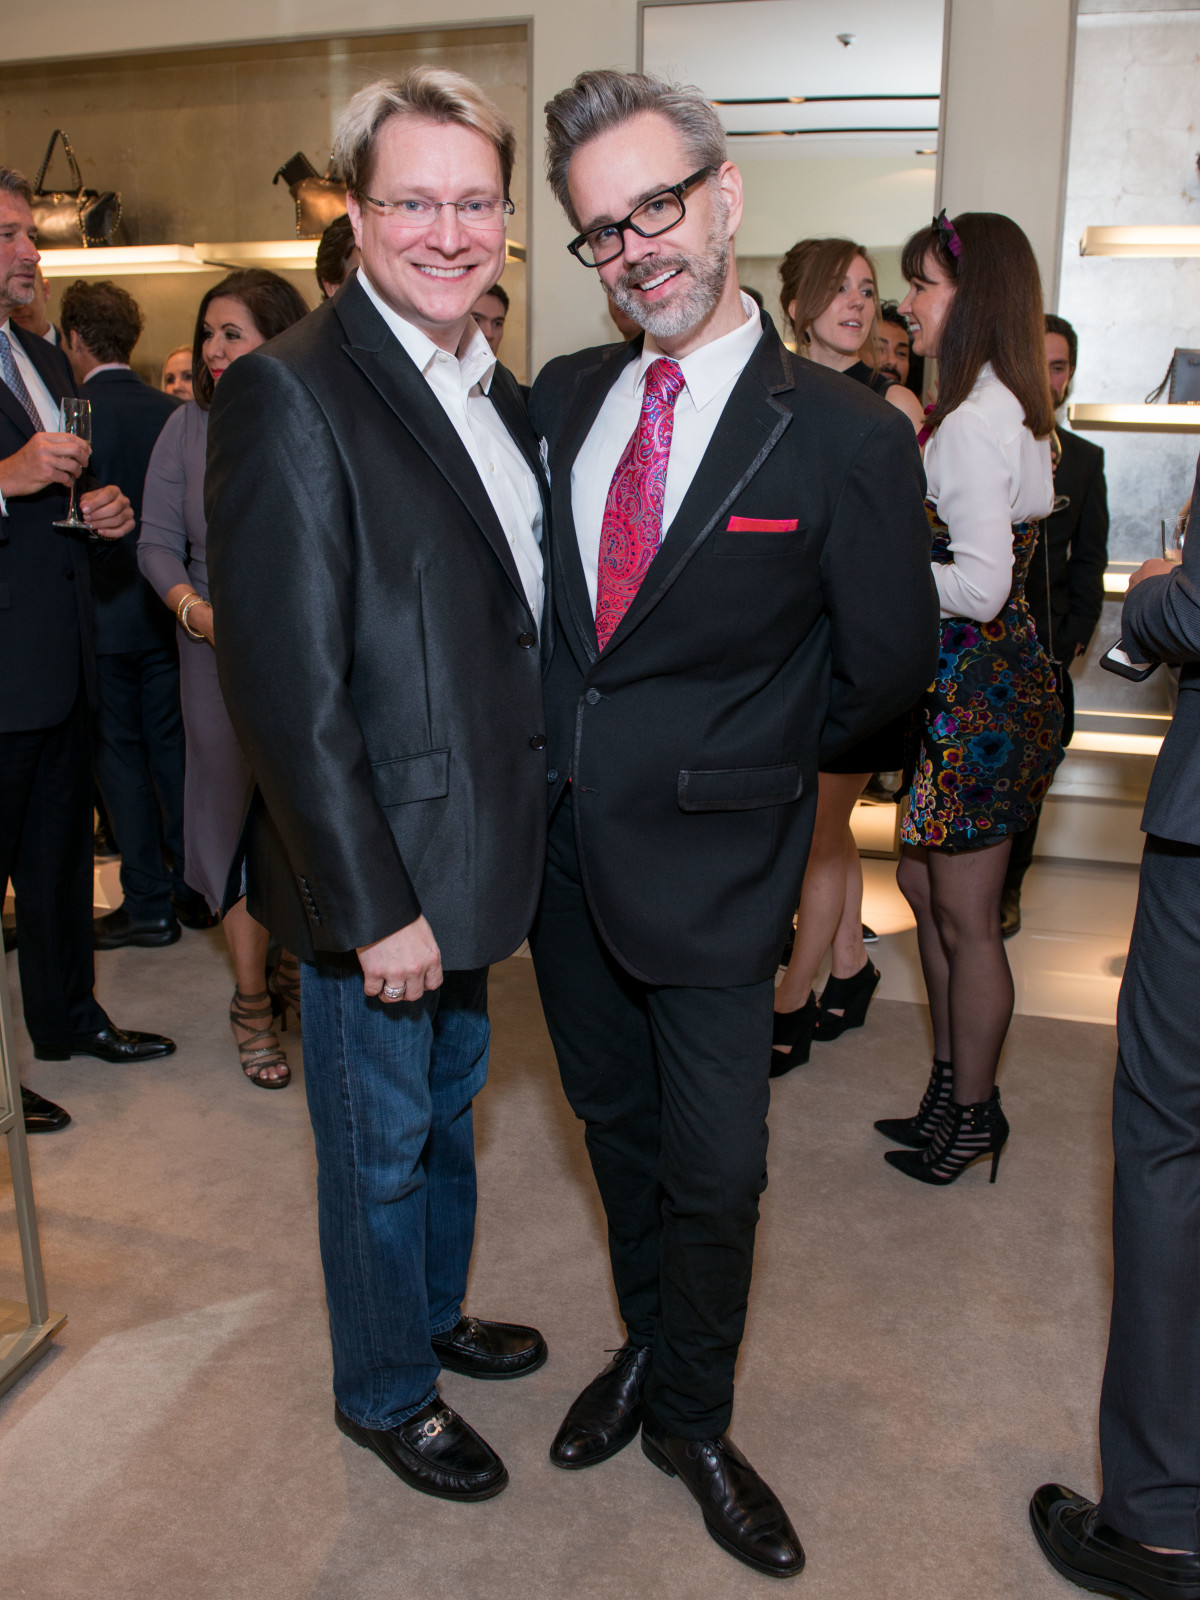 News, Shelby, Heart of Fashion Valentino party, Sept. 2015,Matthew Burrus, Michael Pearce